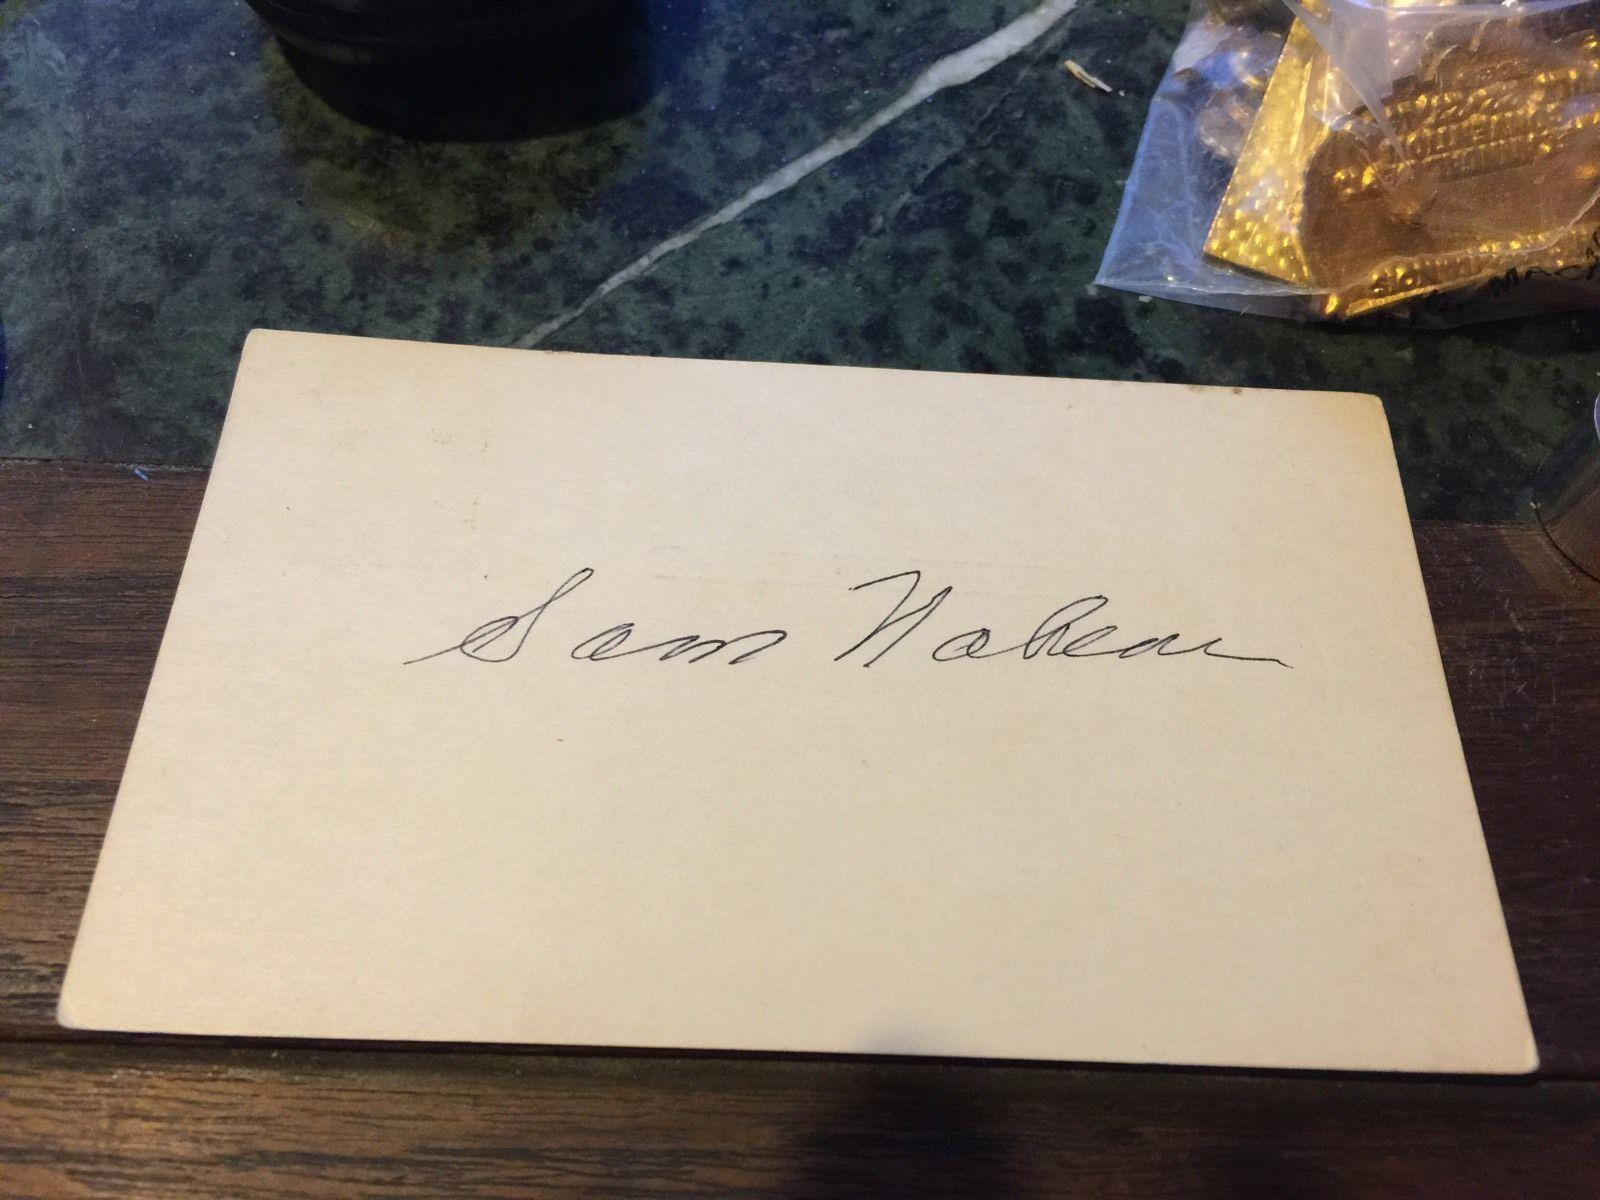 SAM NAHEM HAND SIGNED INDEX CARD DODGERS BASEBALL